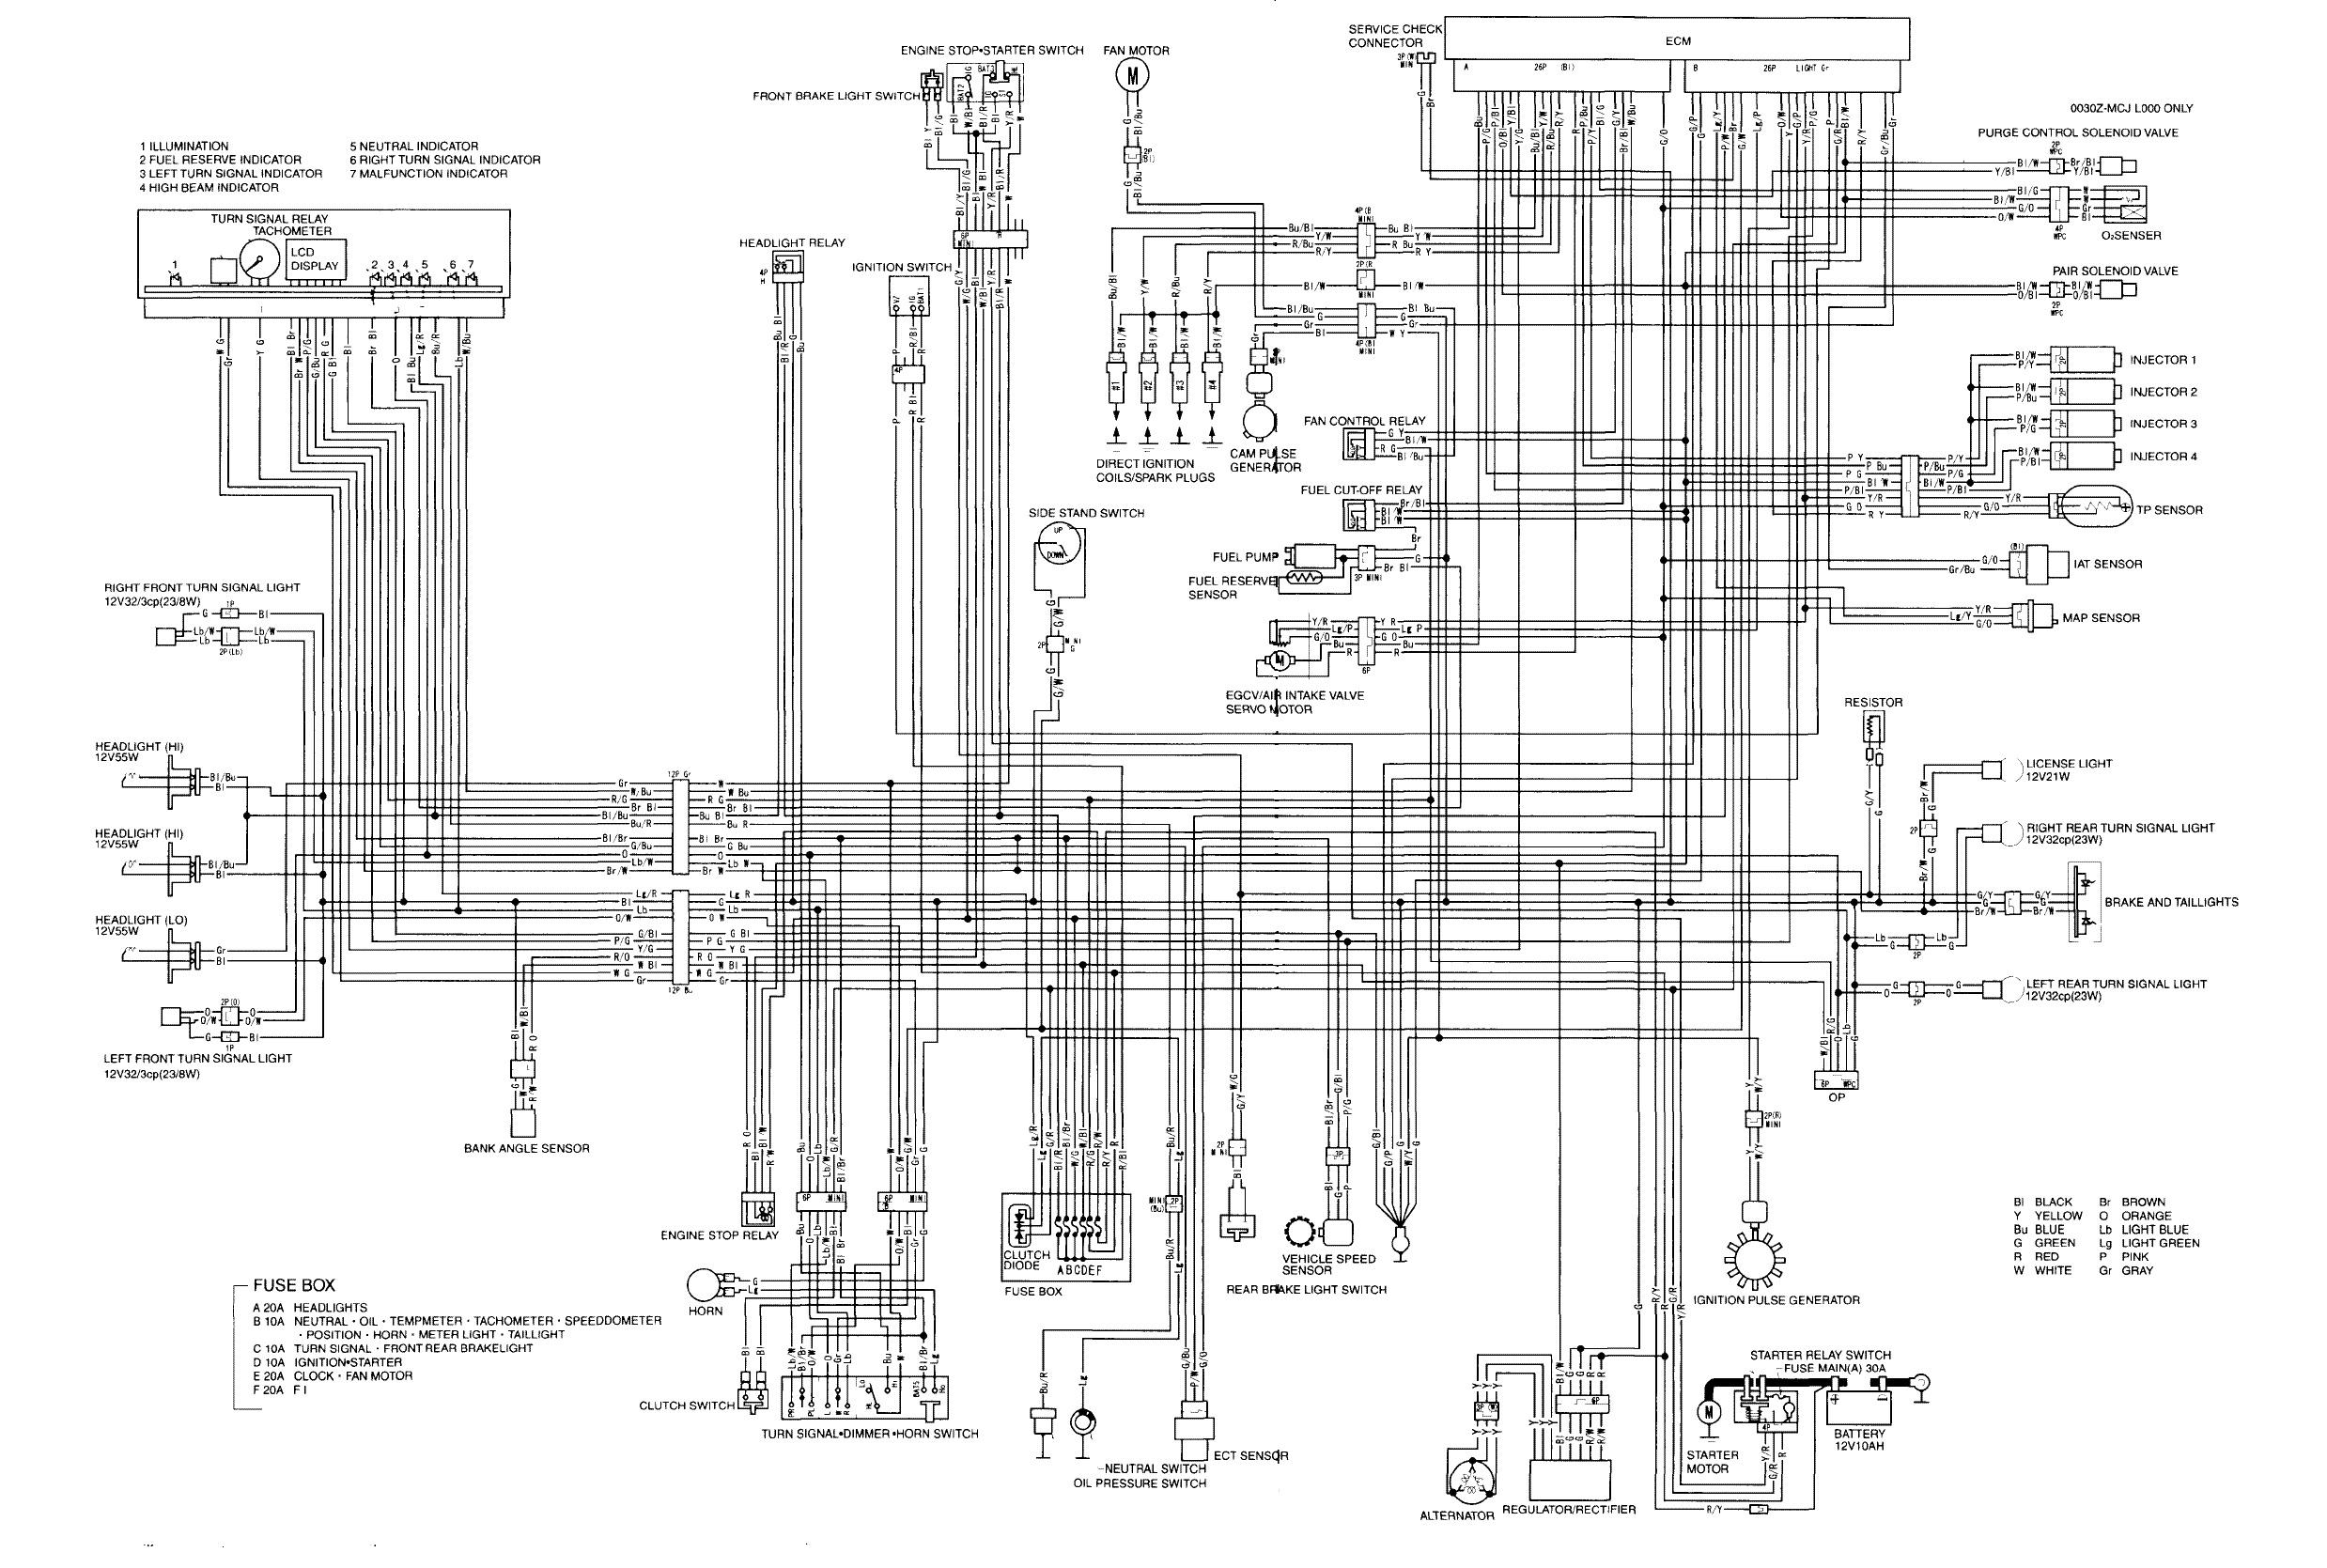 2003 yamaha r6 wiring diagram toyota tundra engine honda cbr600rr auto